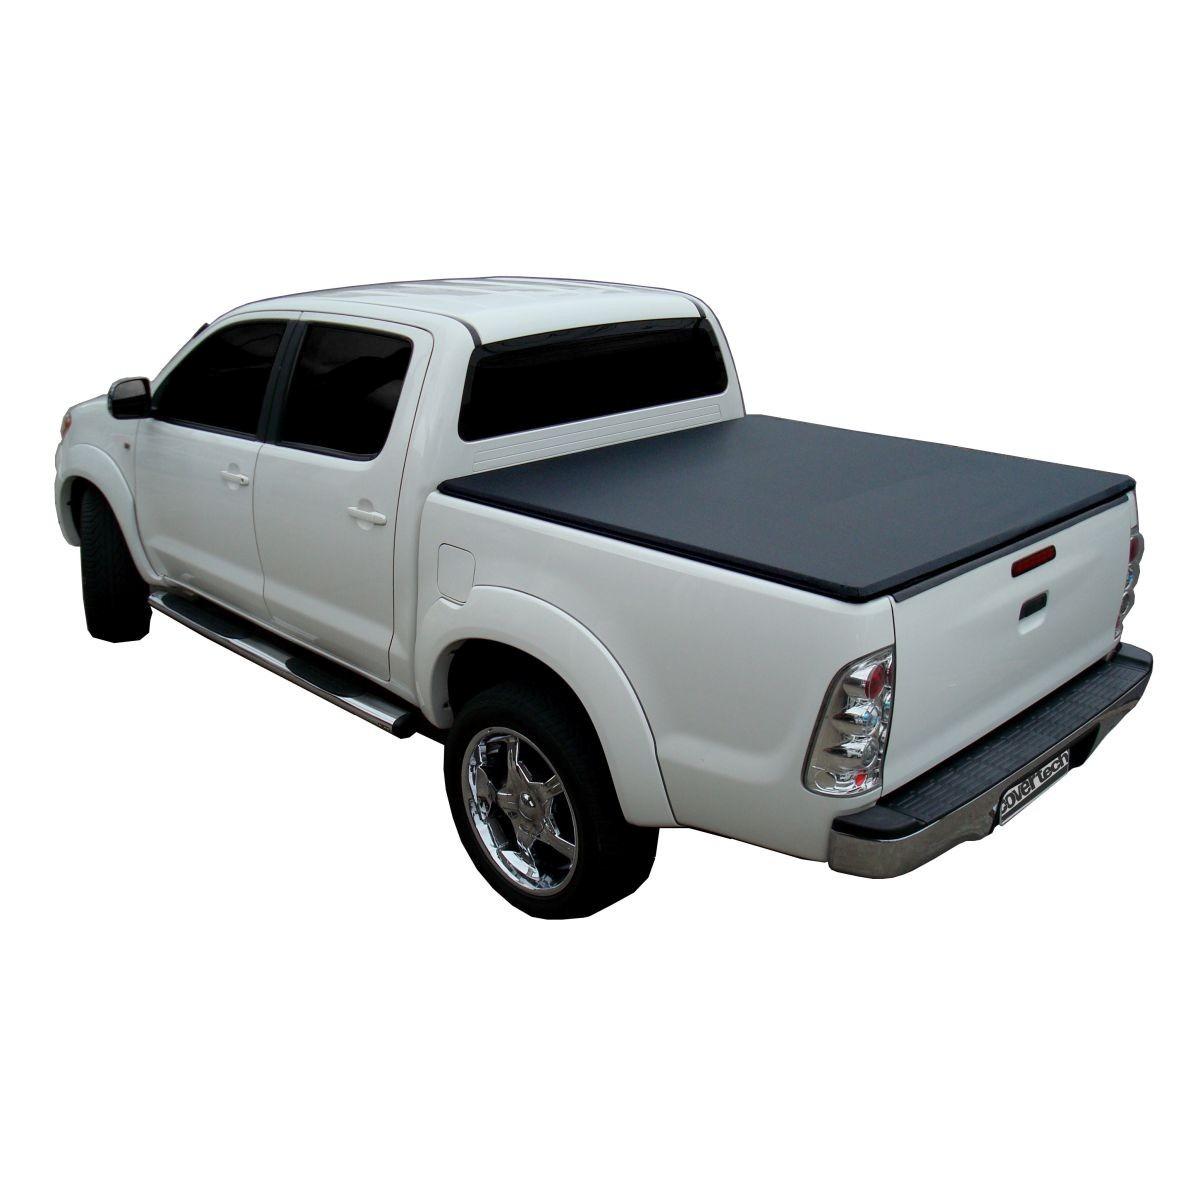 Carpa plana camioneta 4x4 pickup nissan navara for Carpas 4x4 precios